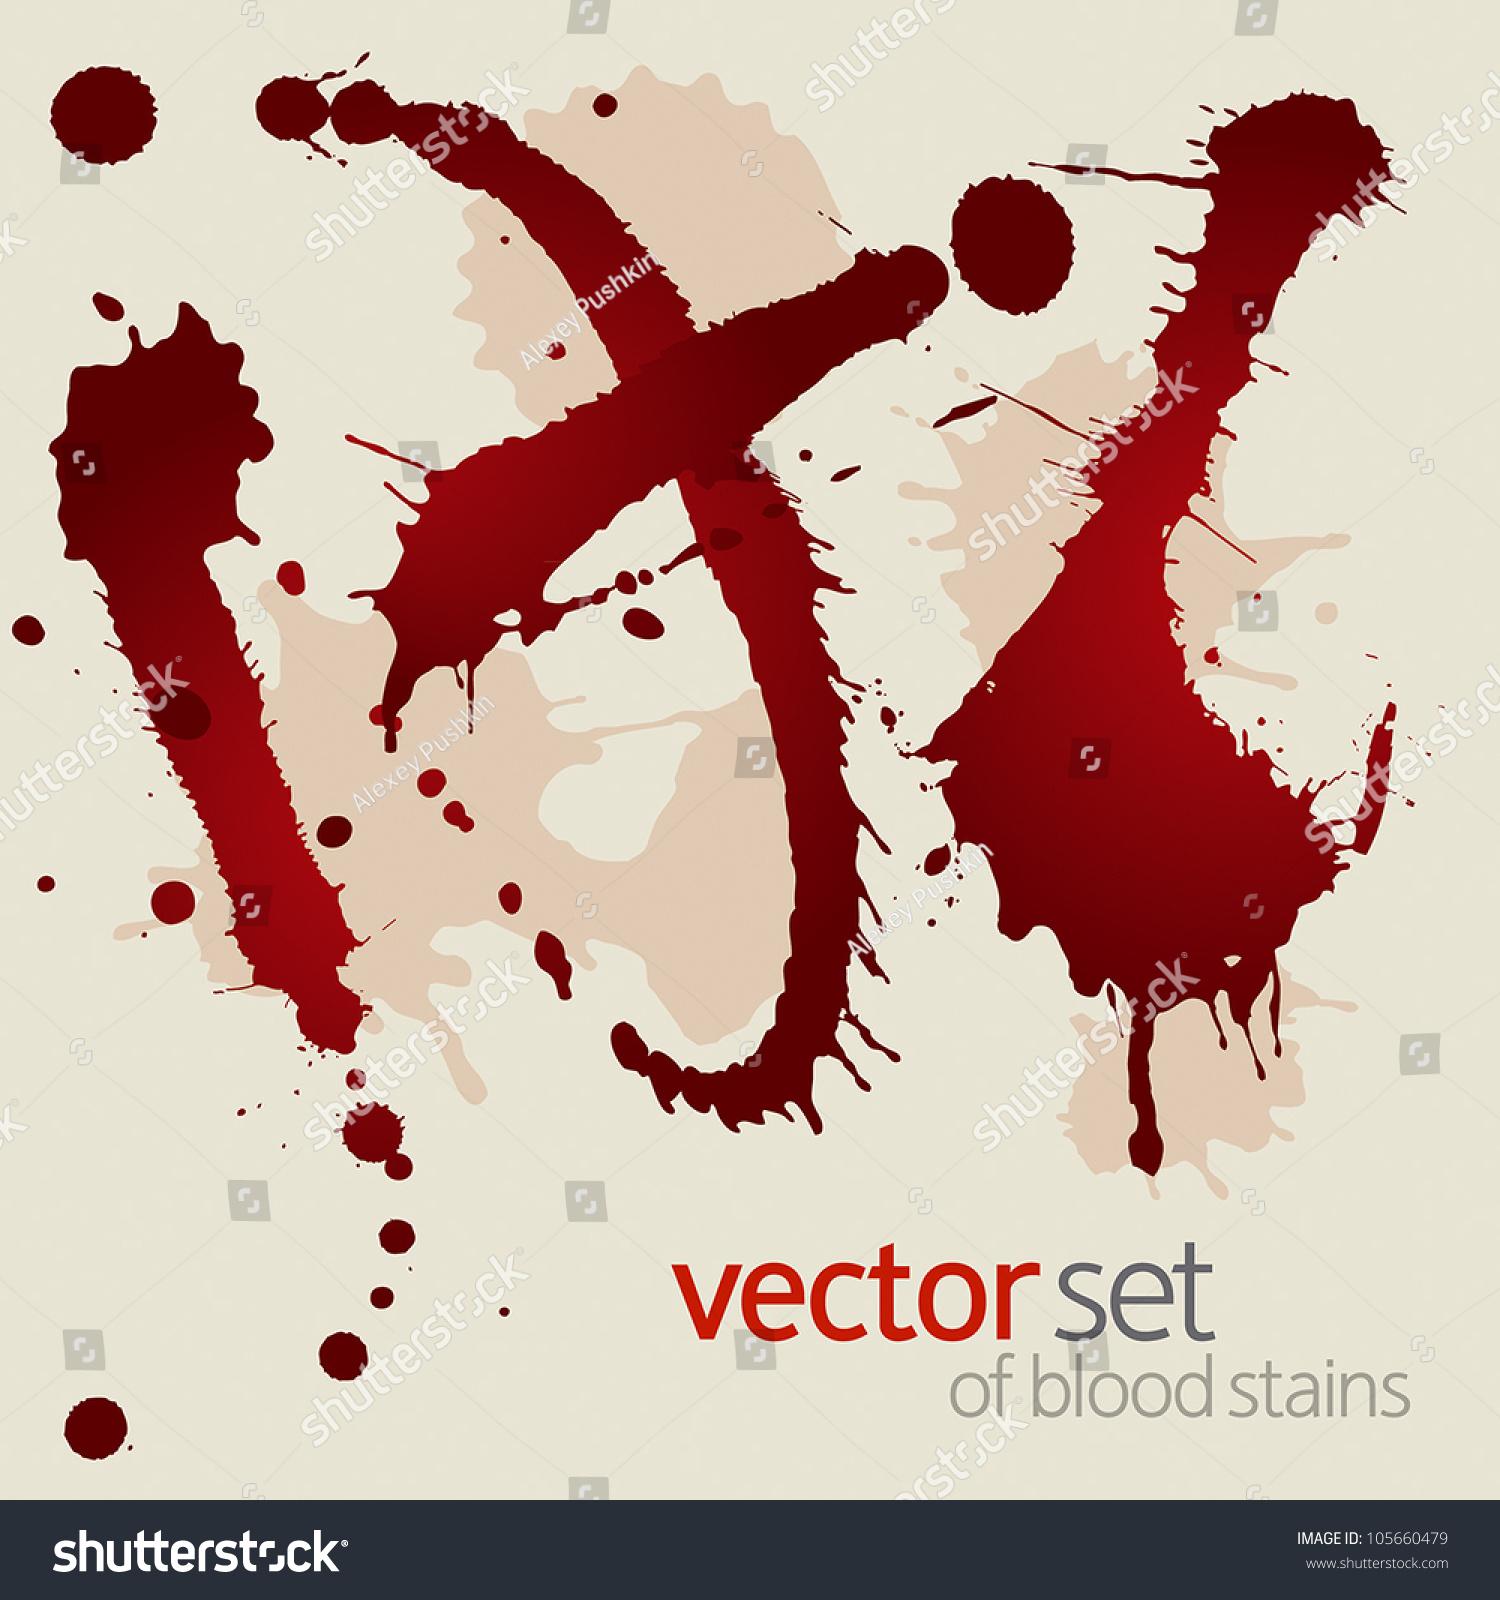 Set Of Blood Stains Stock Vector Illustration 105660479 : Shutterstock